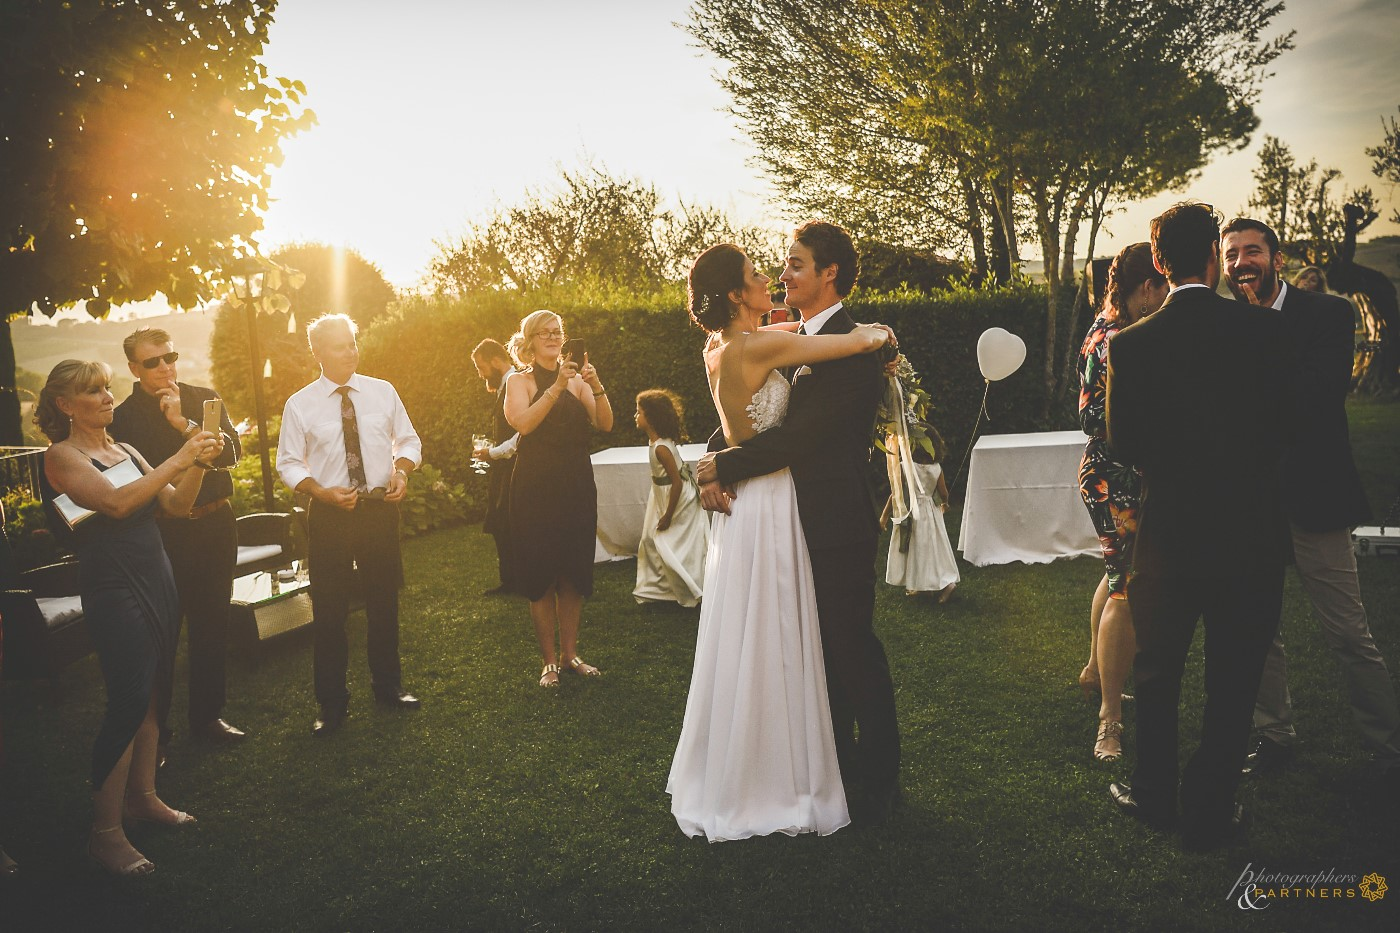 photographer_weddings_montepulciano_15.jpg